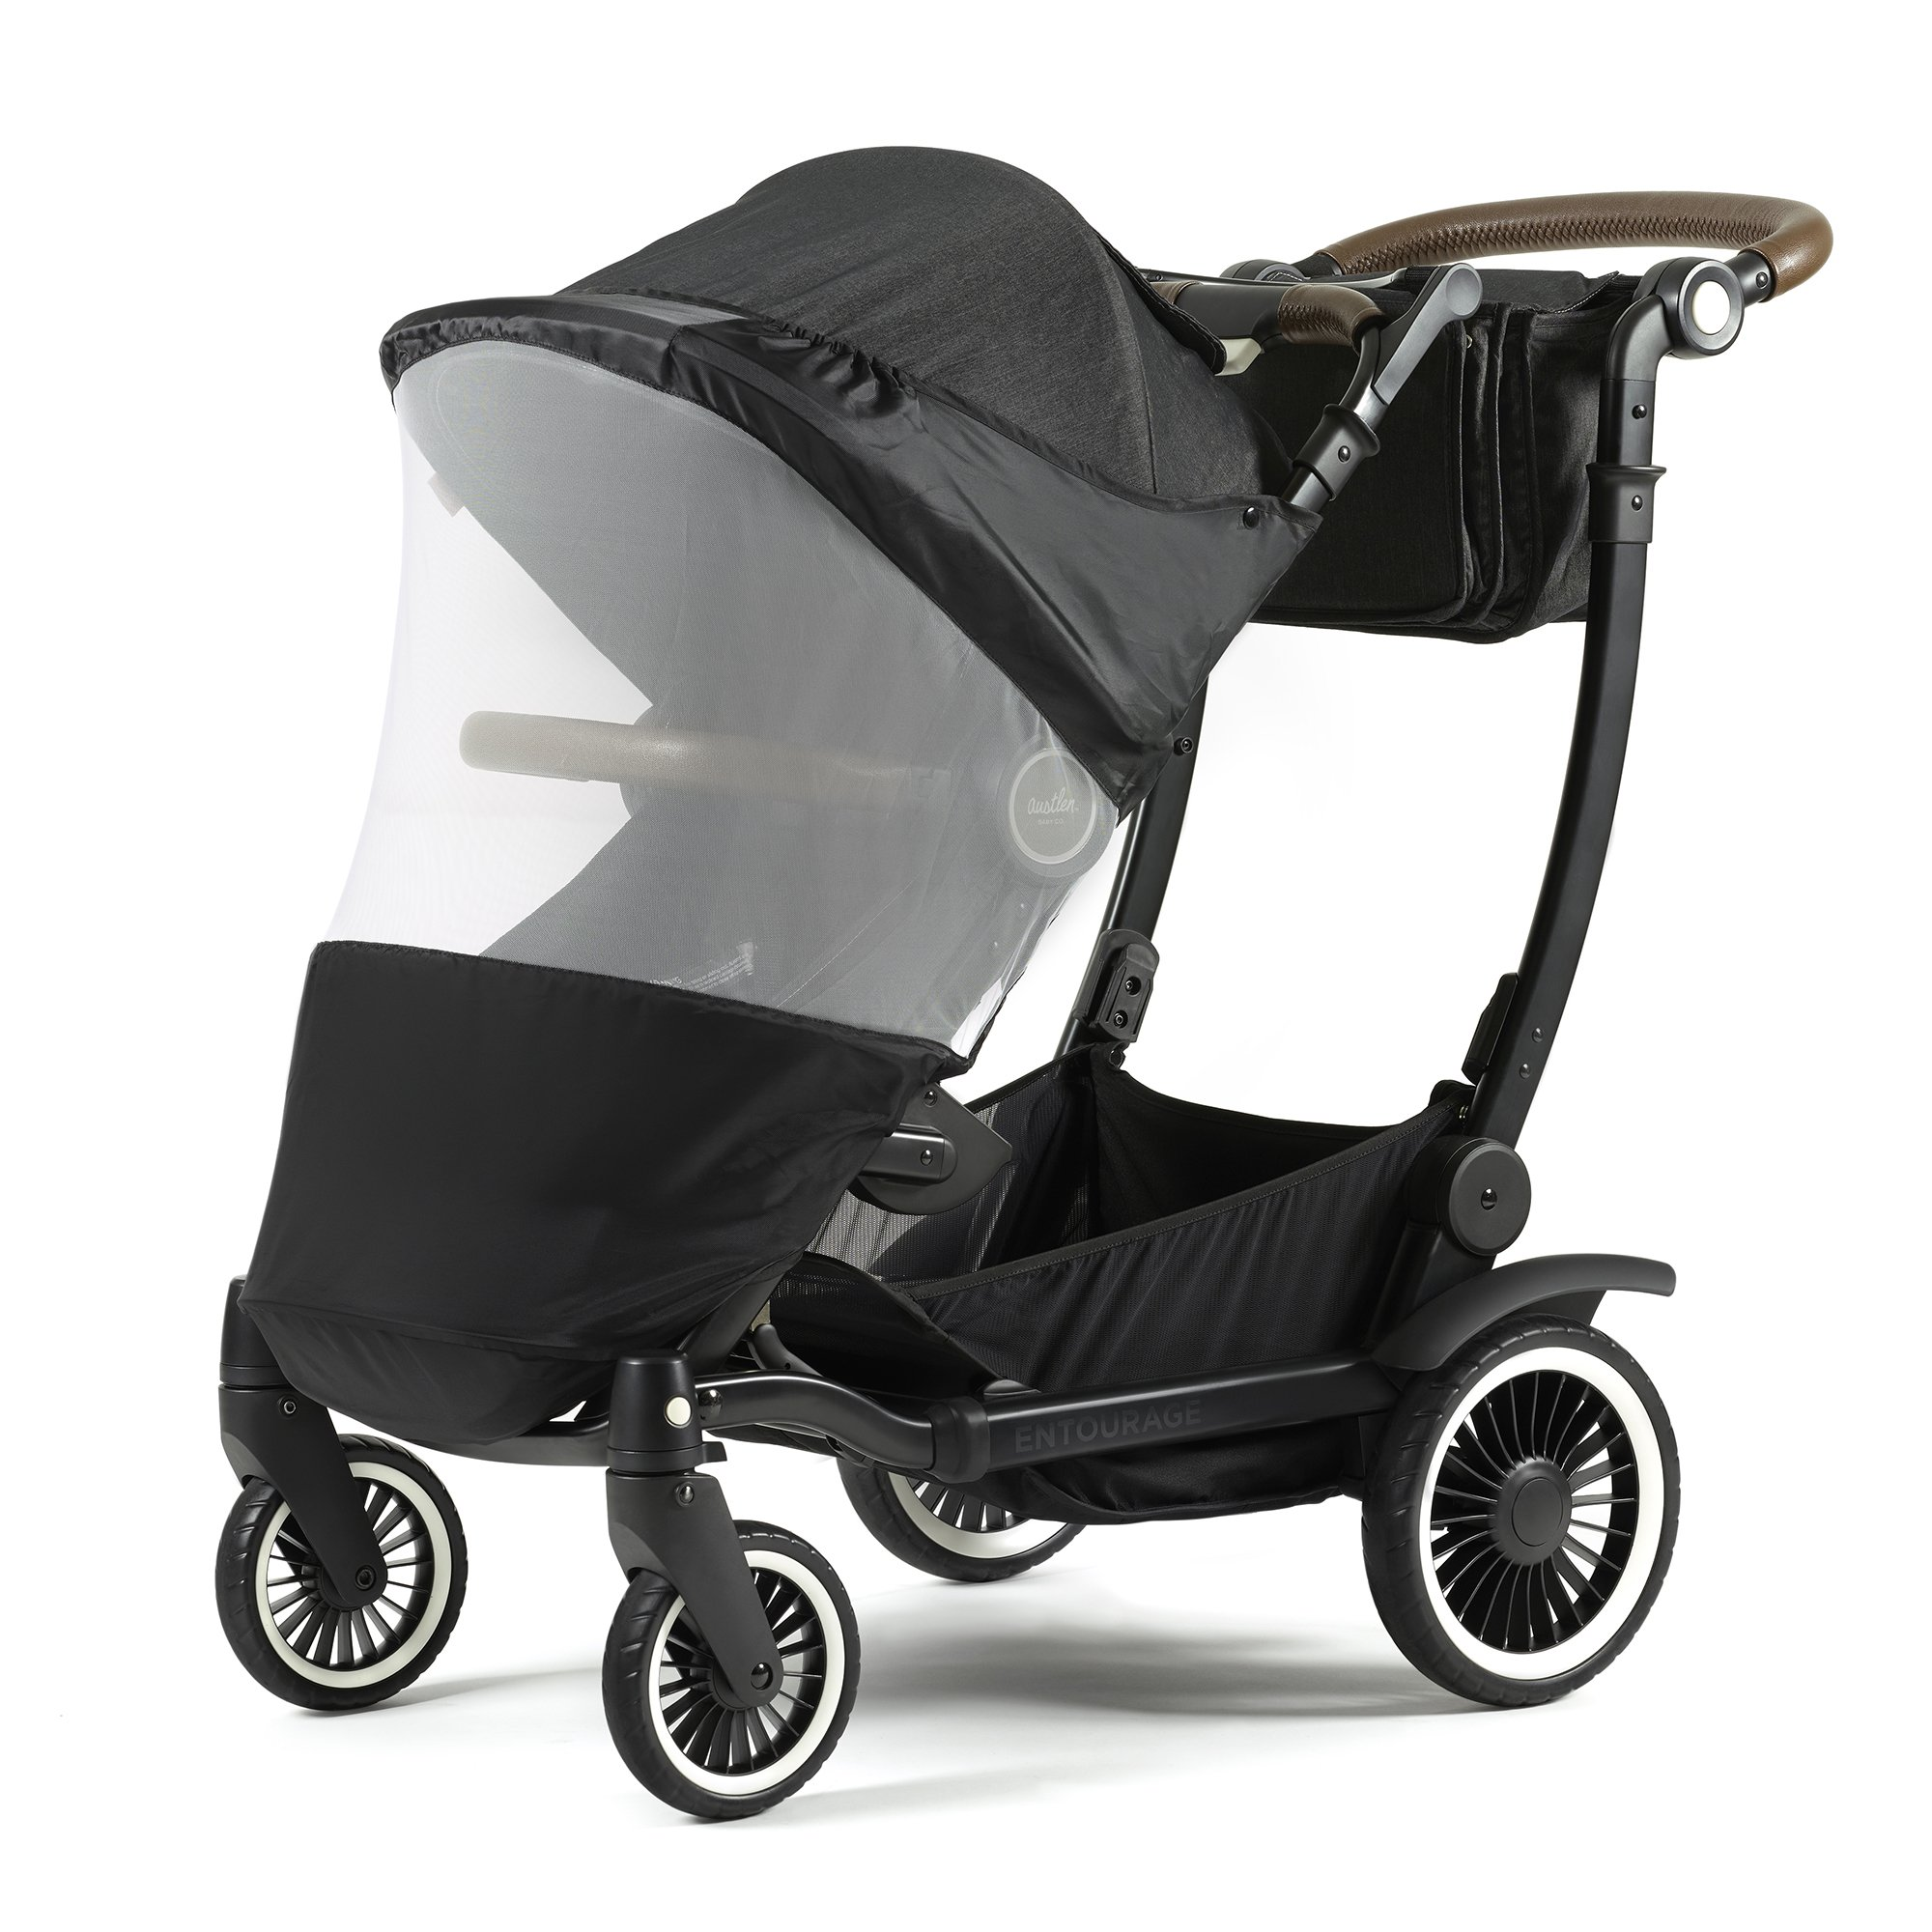 Austlen Entourage Stroller Mosquito Cover: Double Baby Stroller Mosquito Net